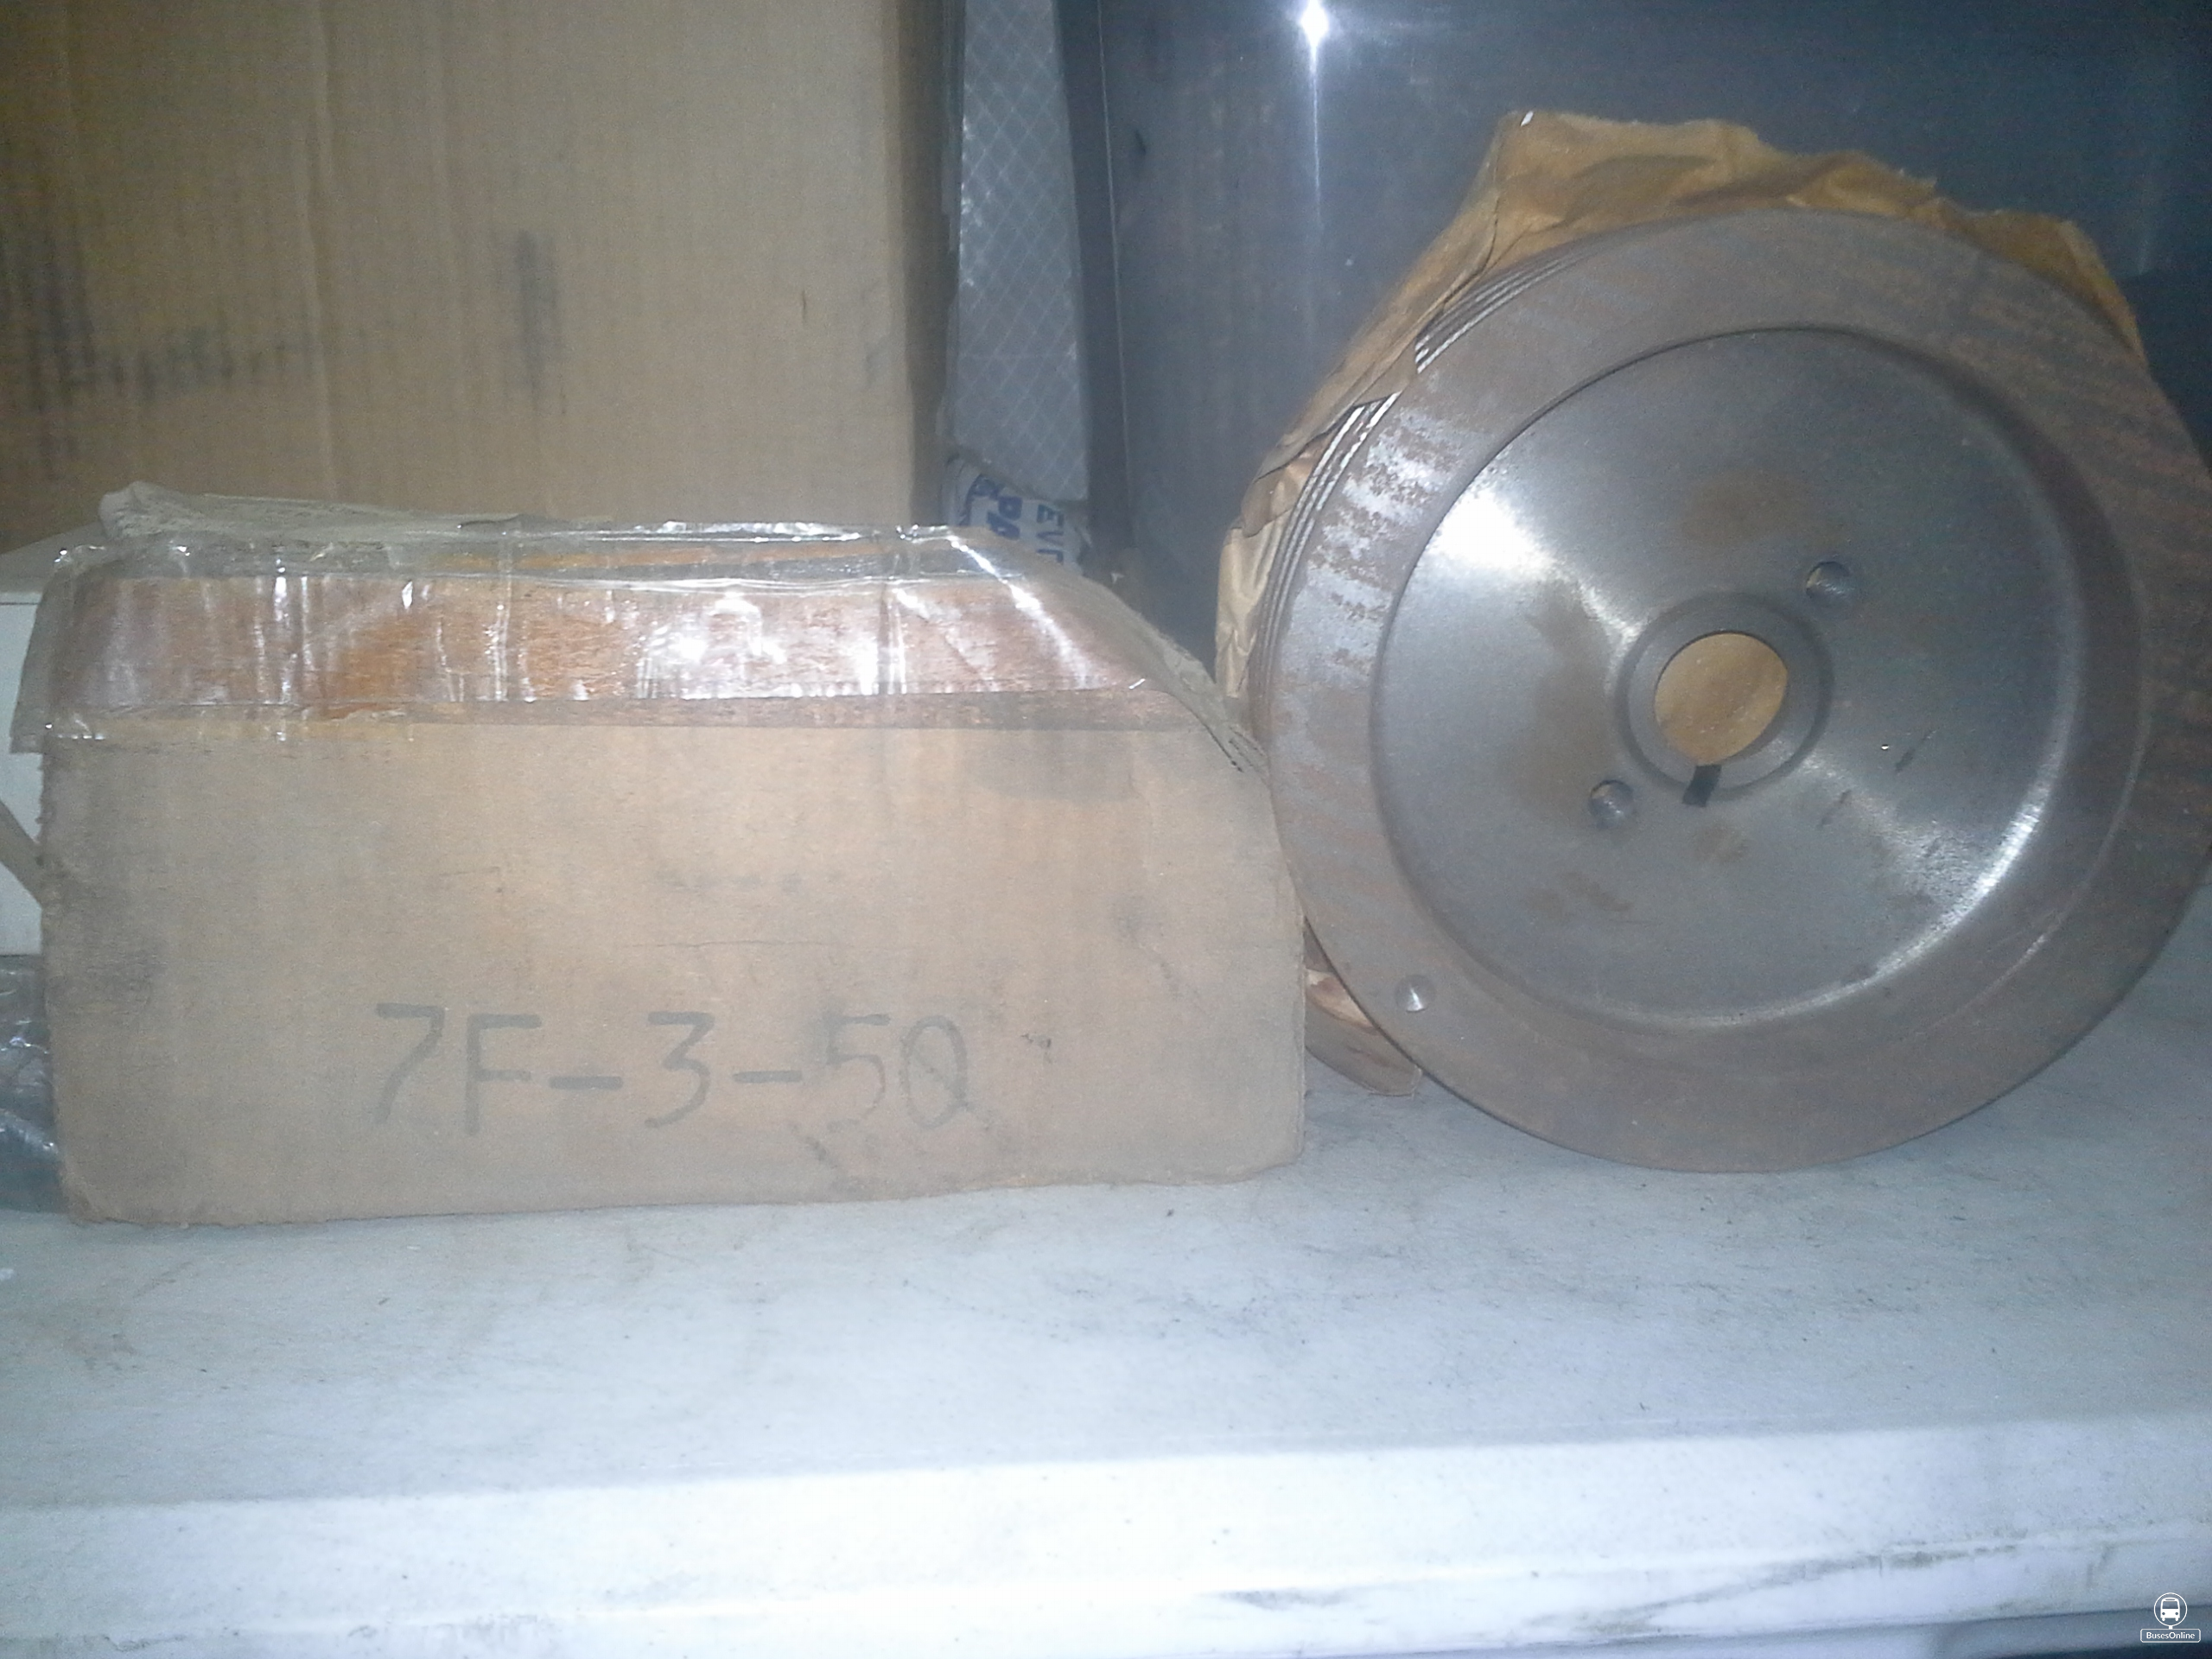 MCI BUS/DETROIT DIESEL mc5 - mc9 8V71 belt drive alternator 4 groove